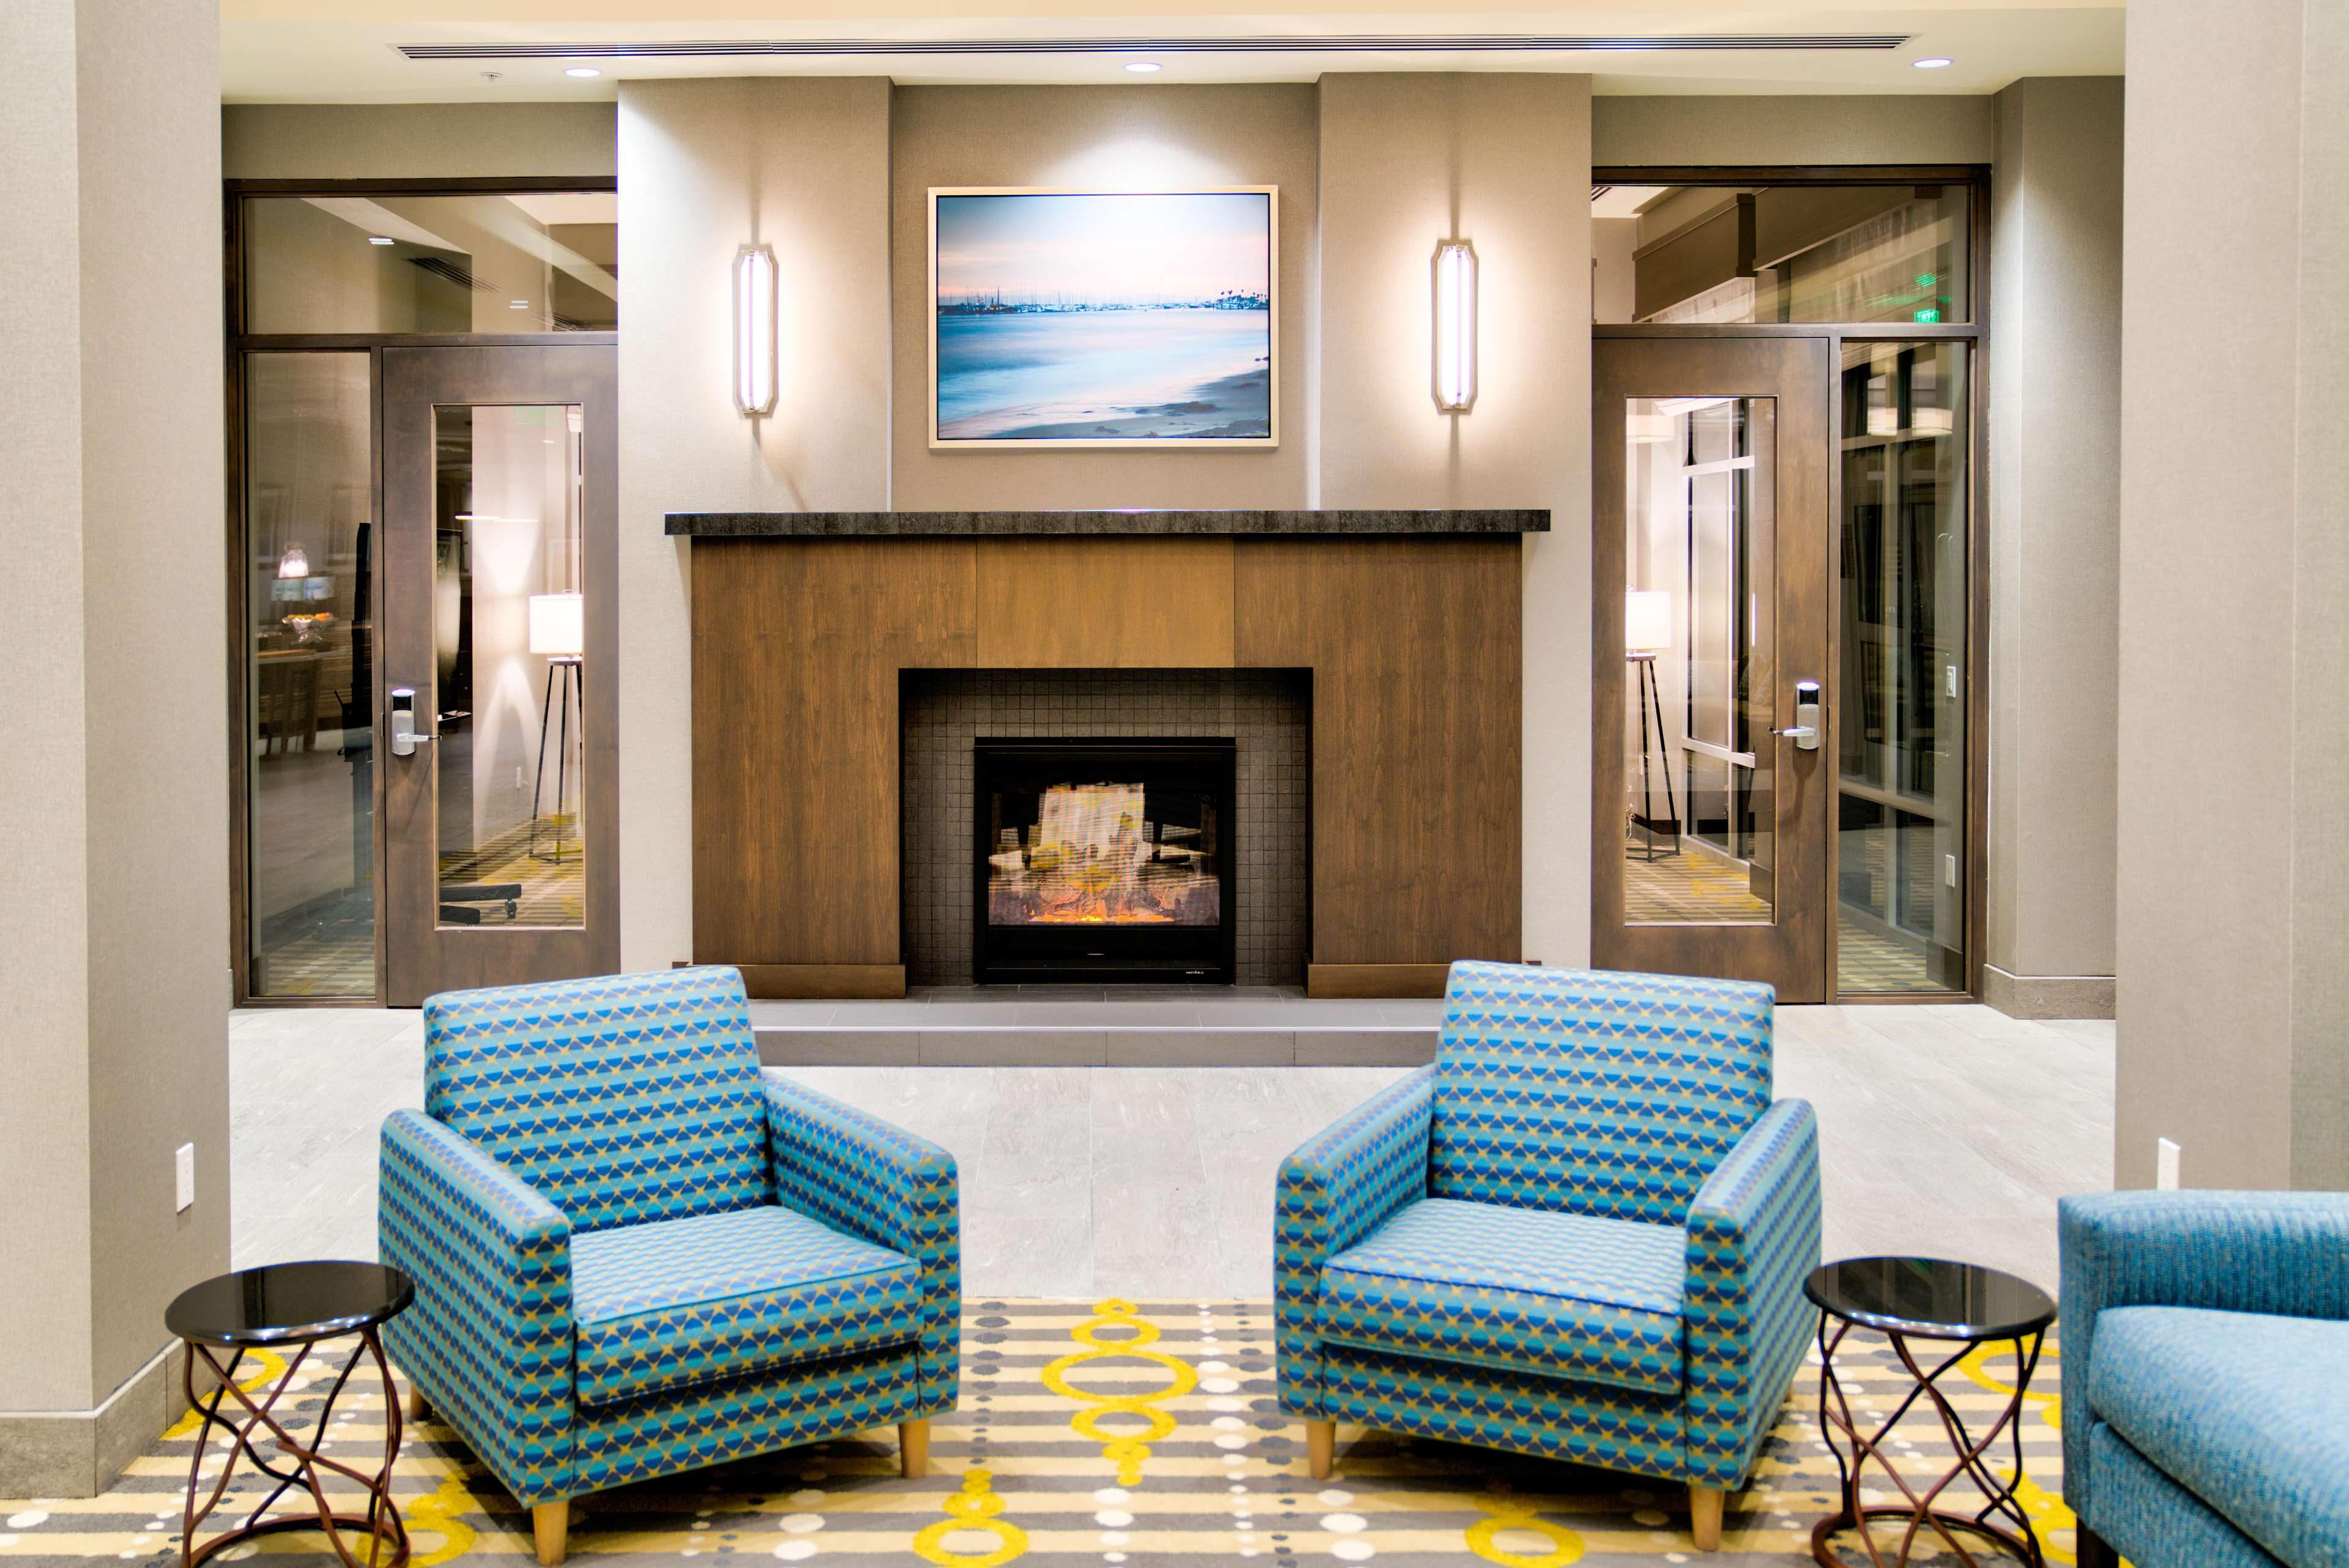 Hilton Garden Inn Santa Barbara/Goleta image 10